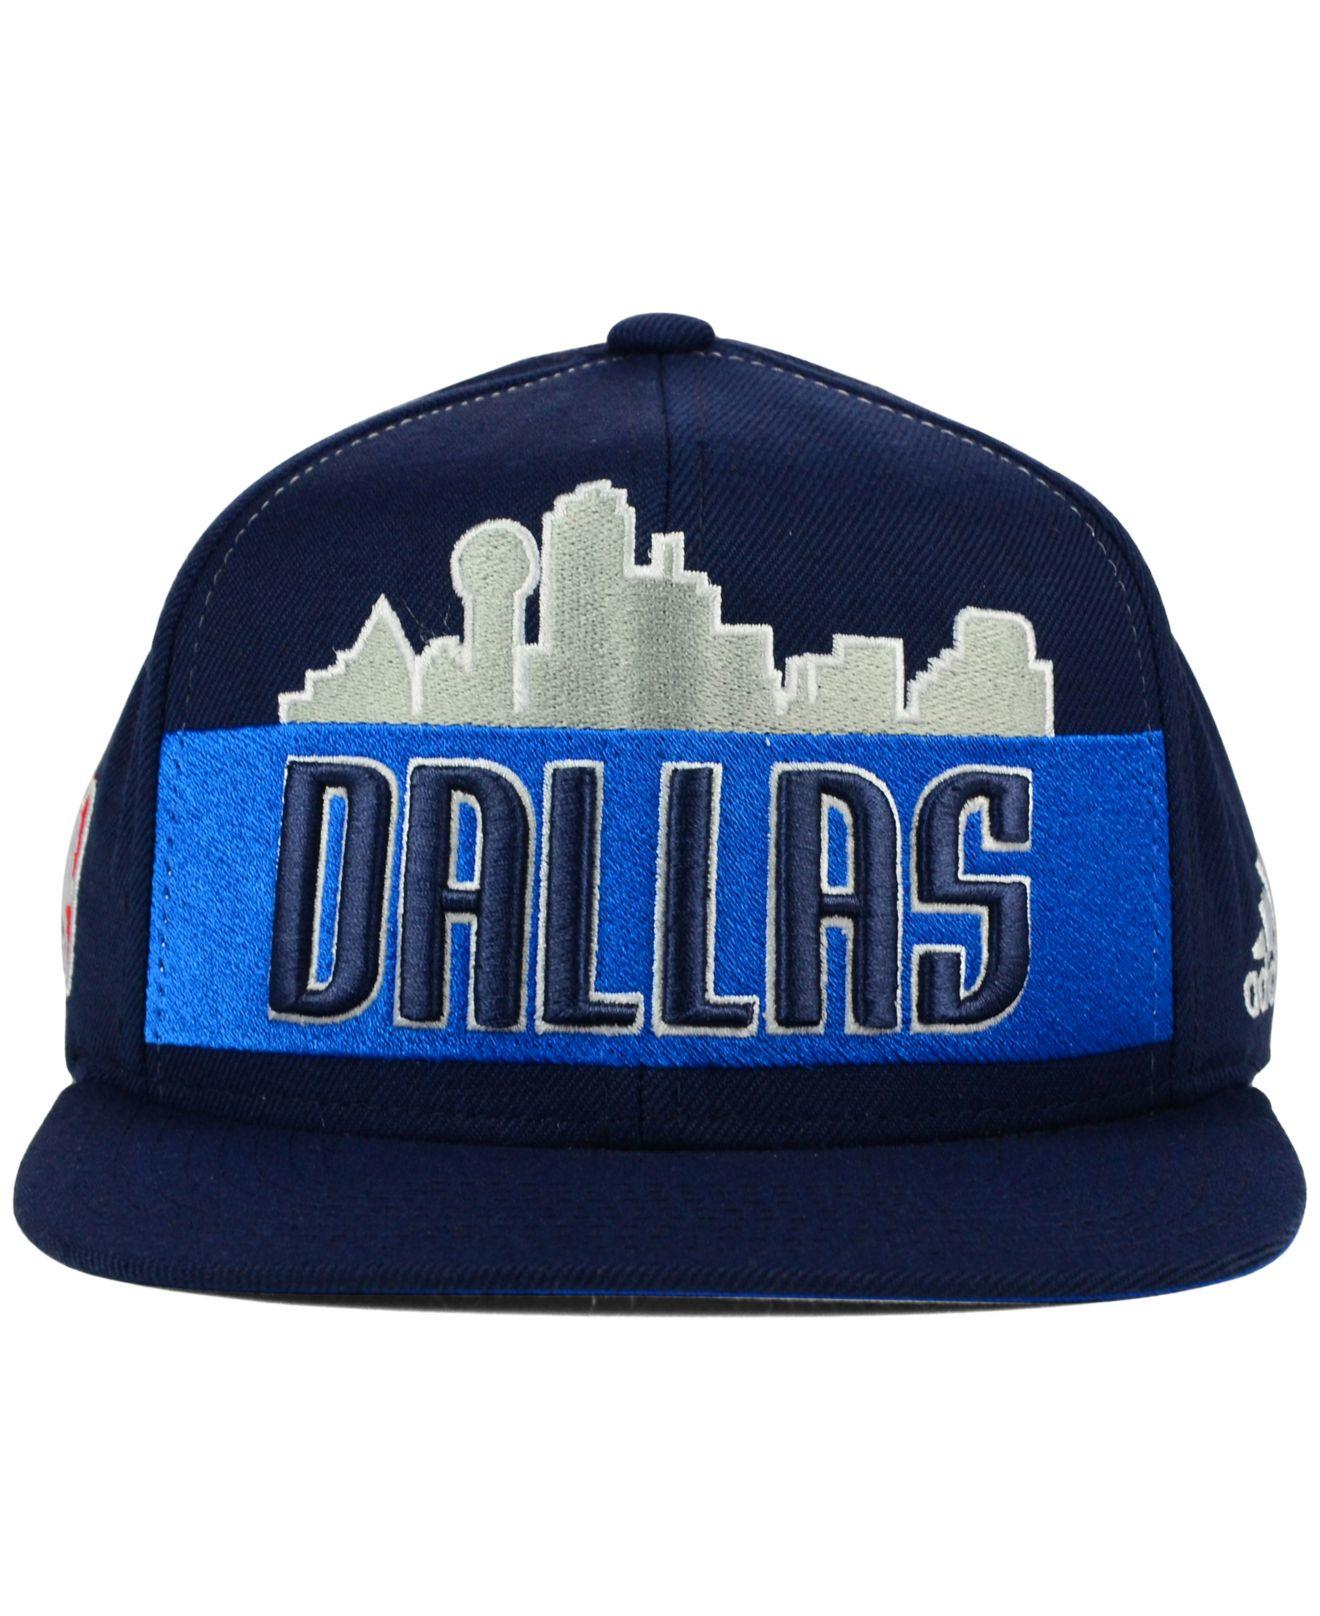 meet 93612 4d5a6 Men's Blue Dallas Mavericks Alternate Jersey Snapback Cap